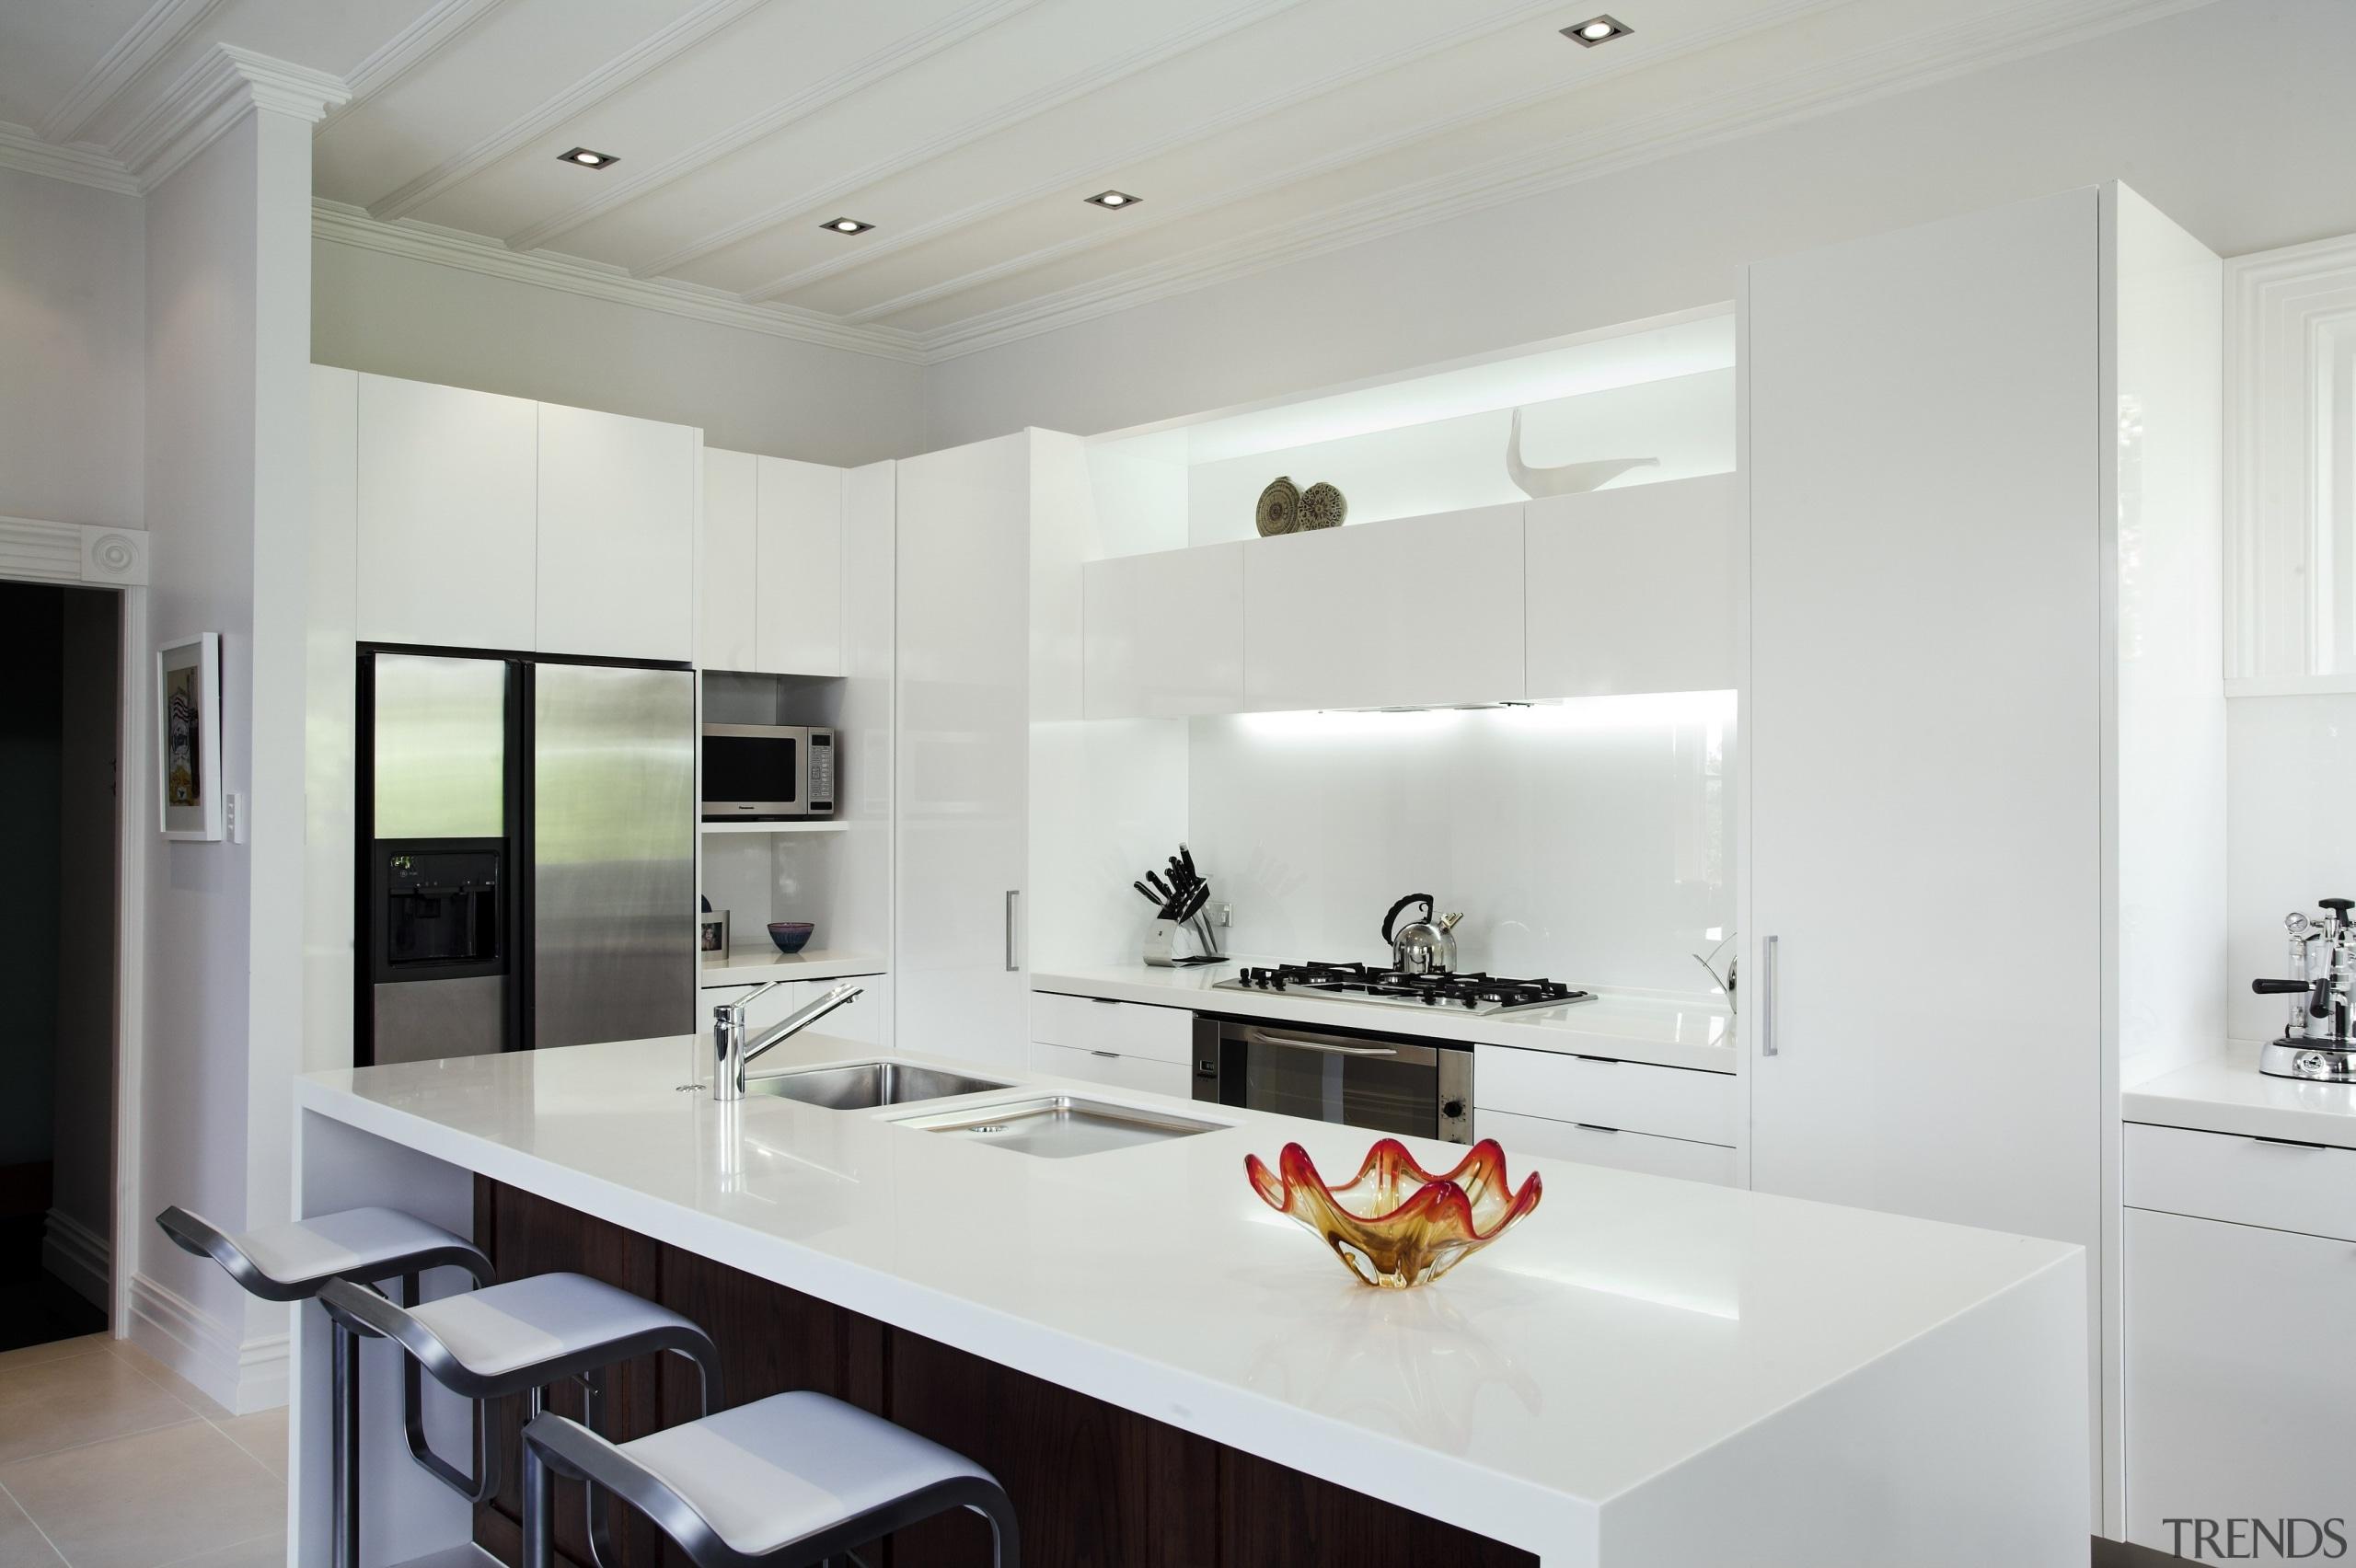 Ponsonby - countertop | cuisine classique | interior countertop, cuisine classique, interior design, kitchen, real estate, gray, white